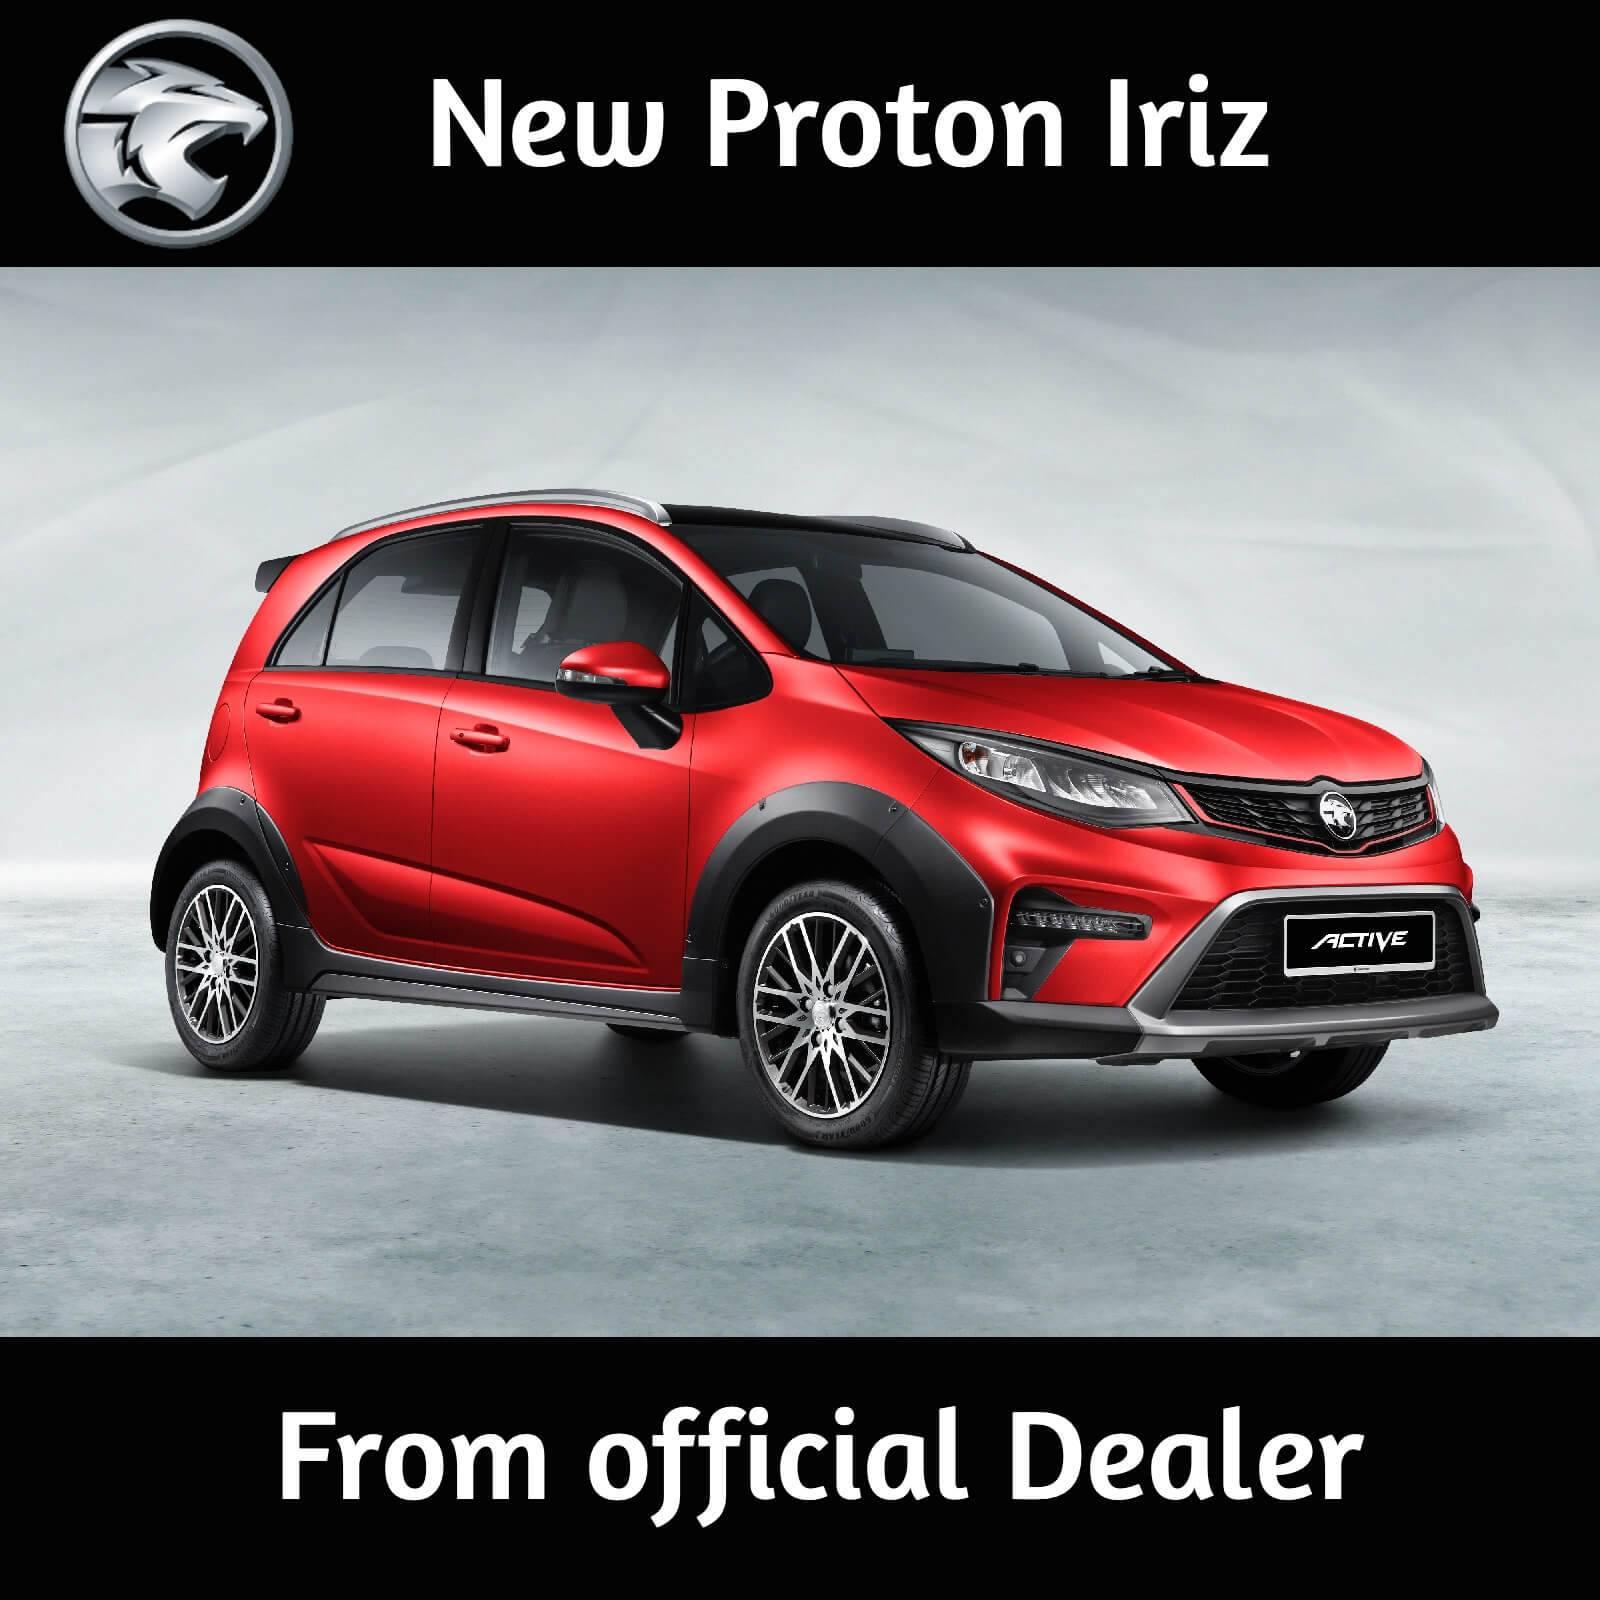 2021 Proton Iriz 1.6 CVT Active